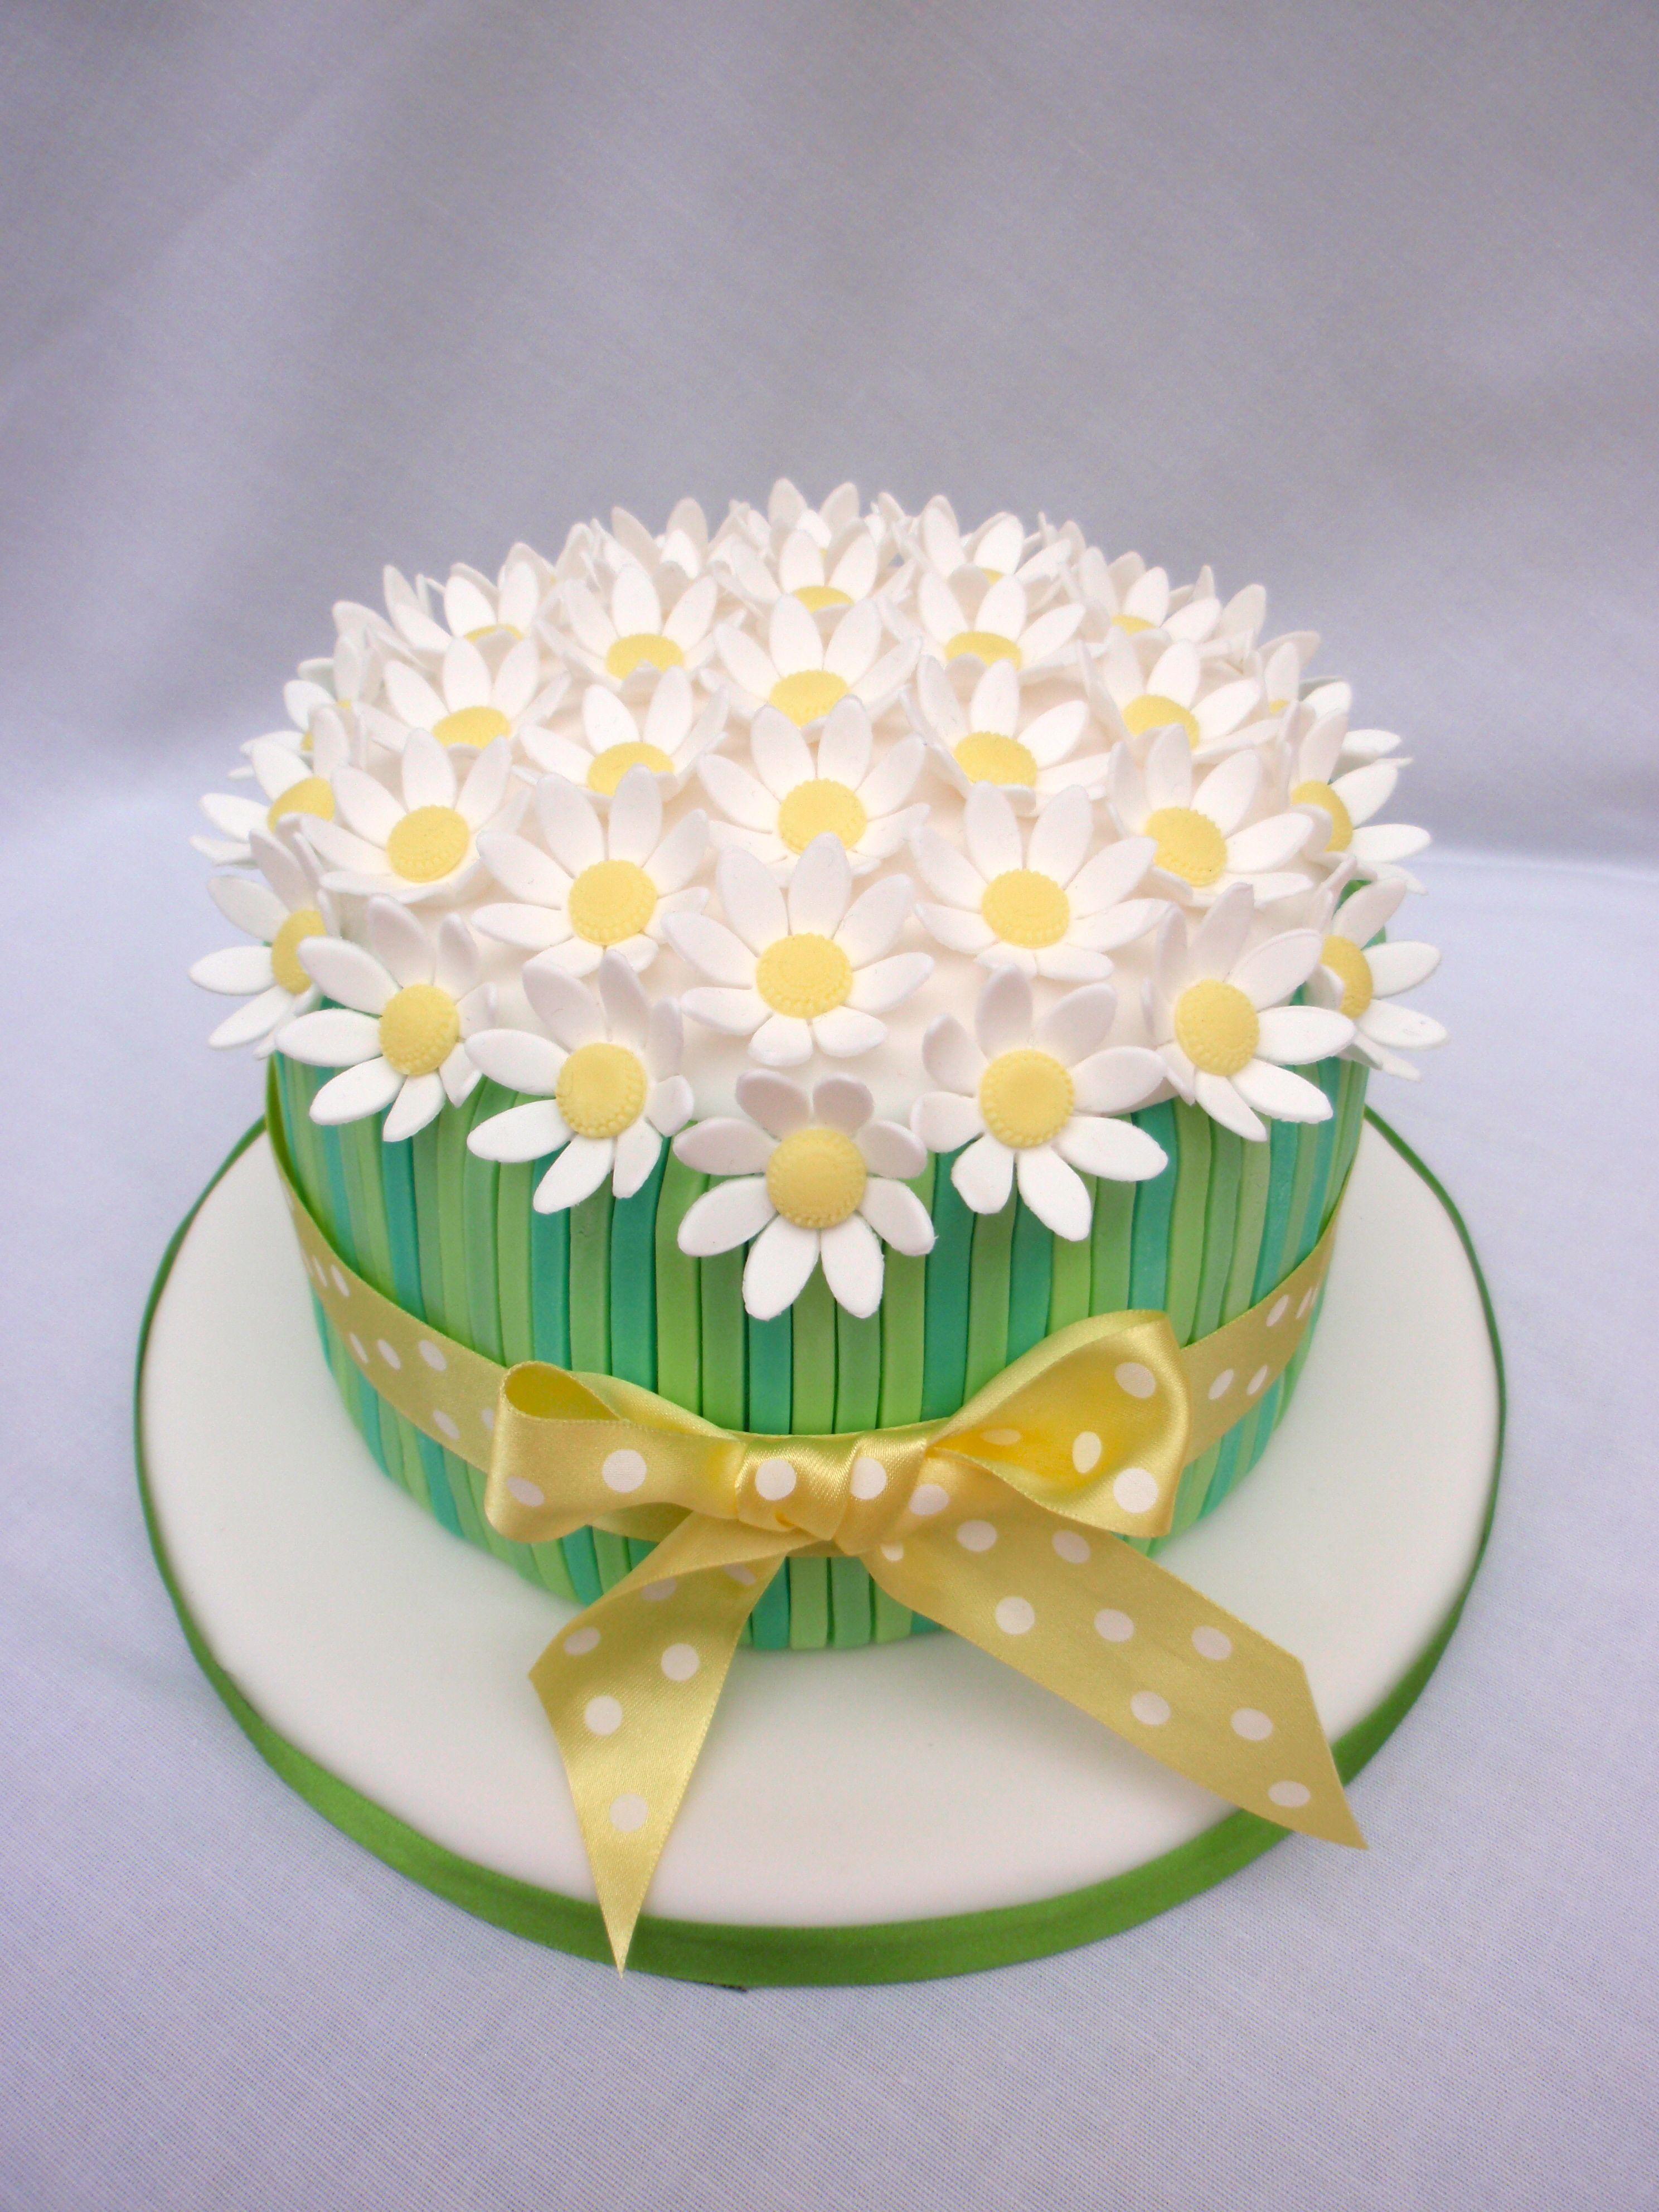 Groovy Daisy Birthday Cake With Images Daisy Cakes Birthday Cake Funny Birthday Cards Online Elaedamsfinfo